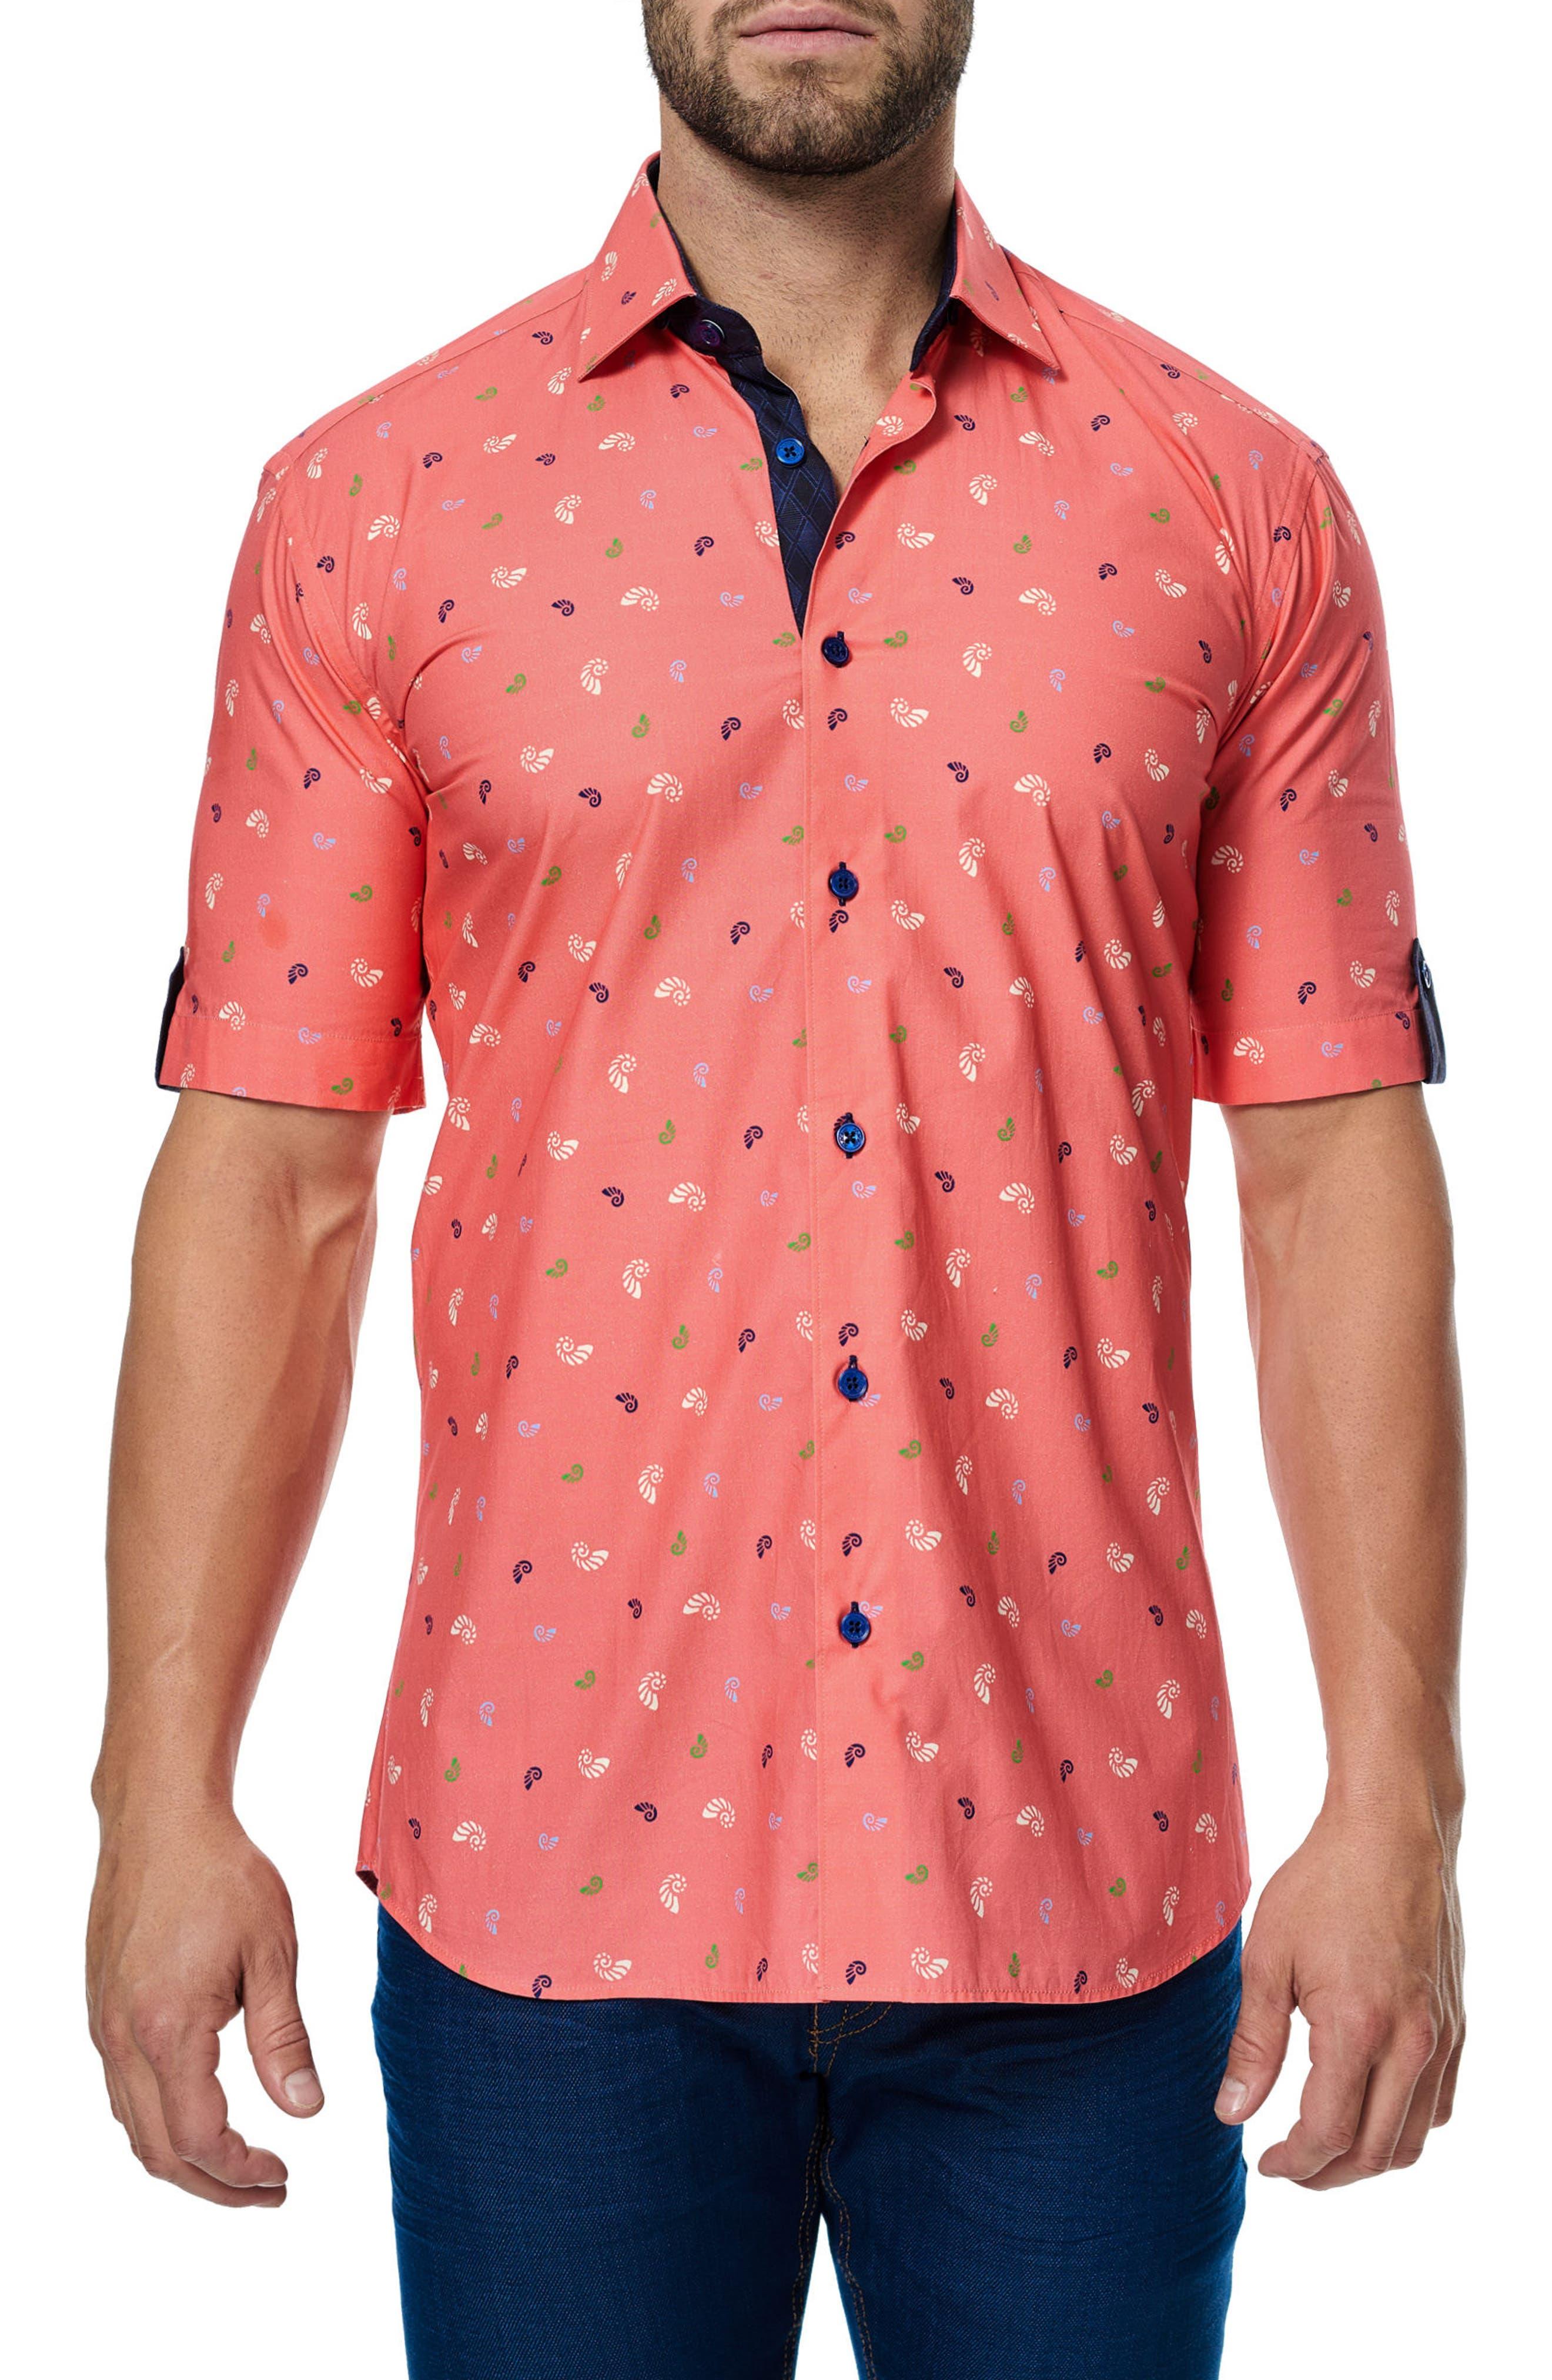 Maceoo Fresh Shell Print Trim Fit Sport Shirt